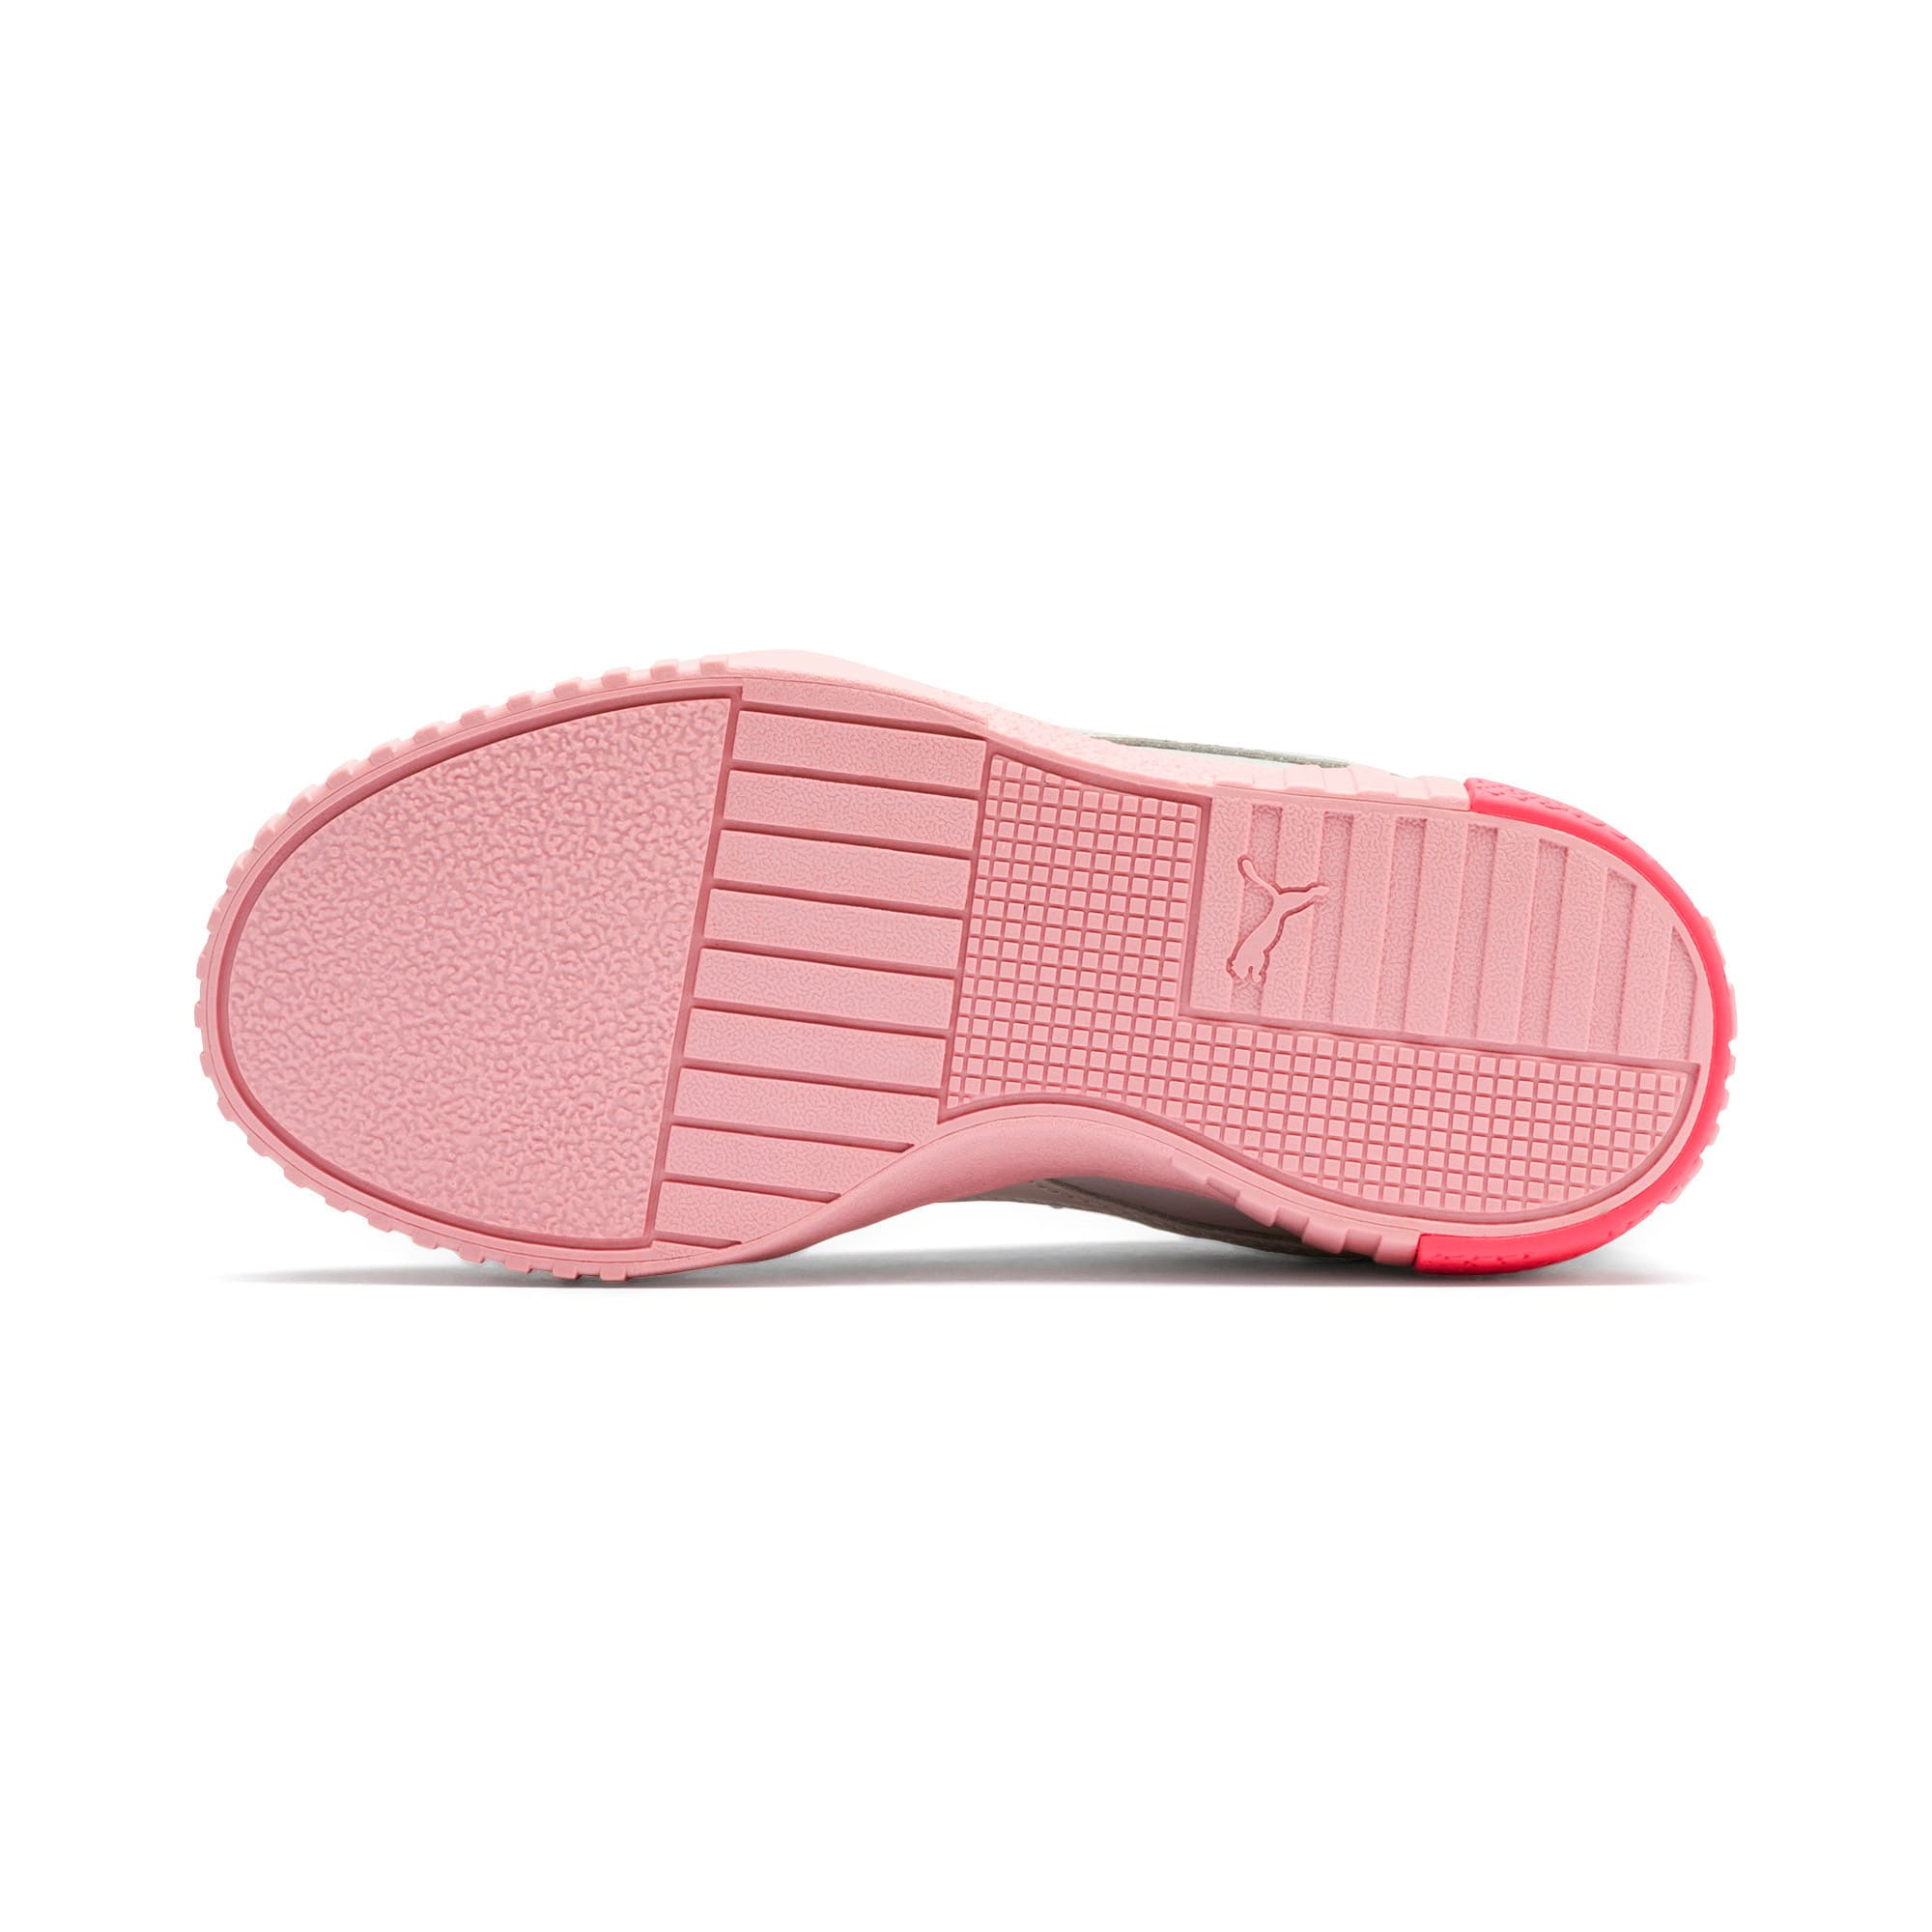 Thumbnail 4 of Cali Kids' Mädchen Sneaker, Gray Violet-Calypso Coral, medium